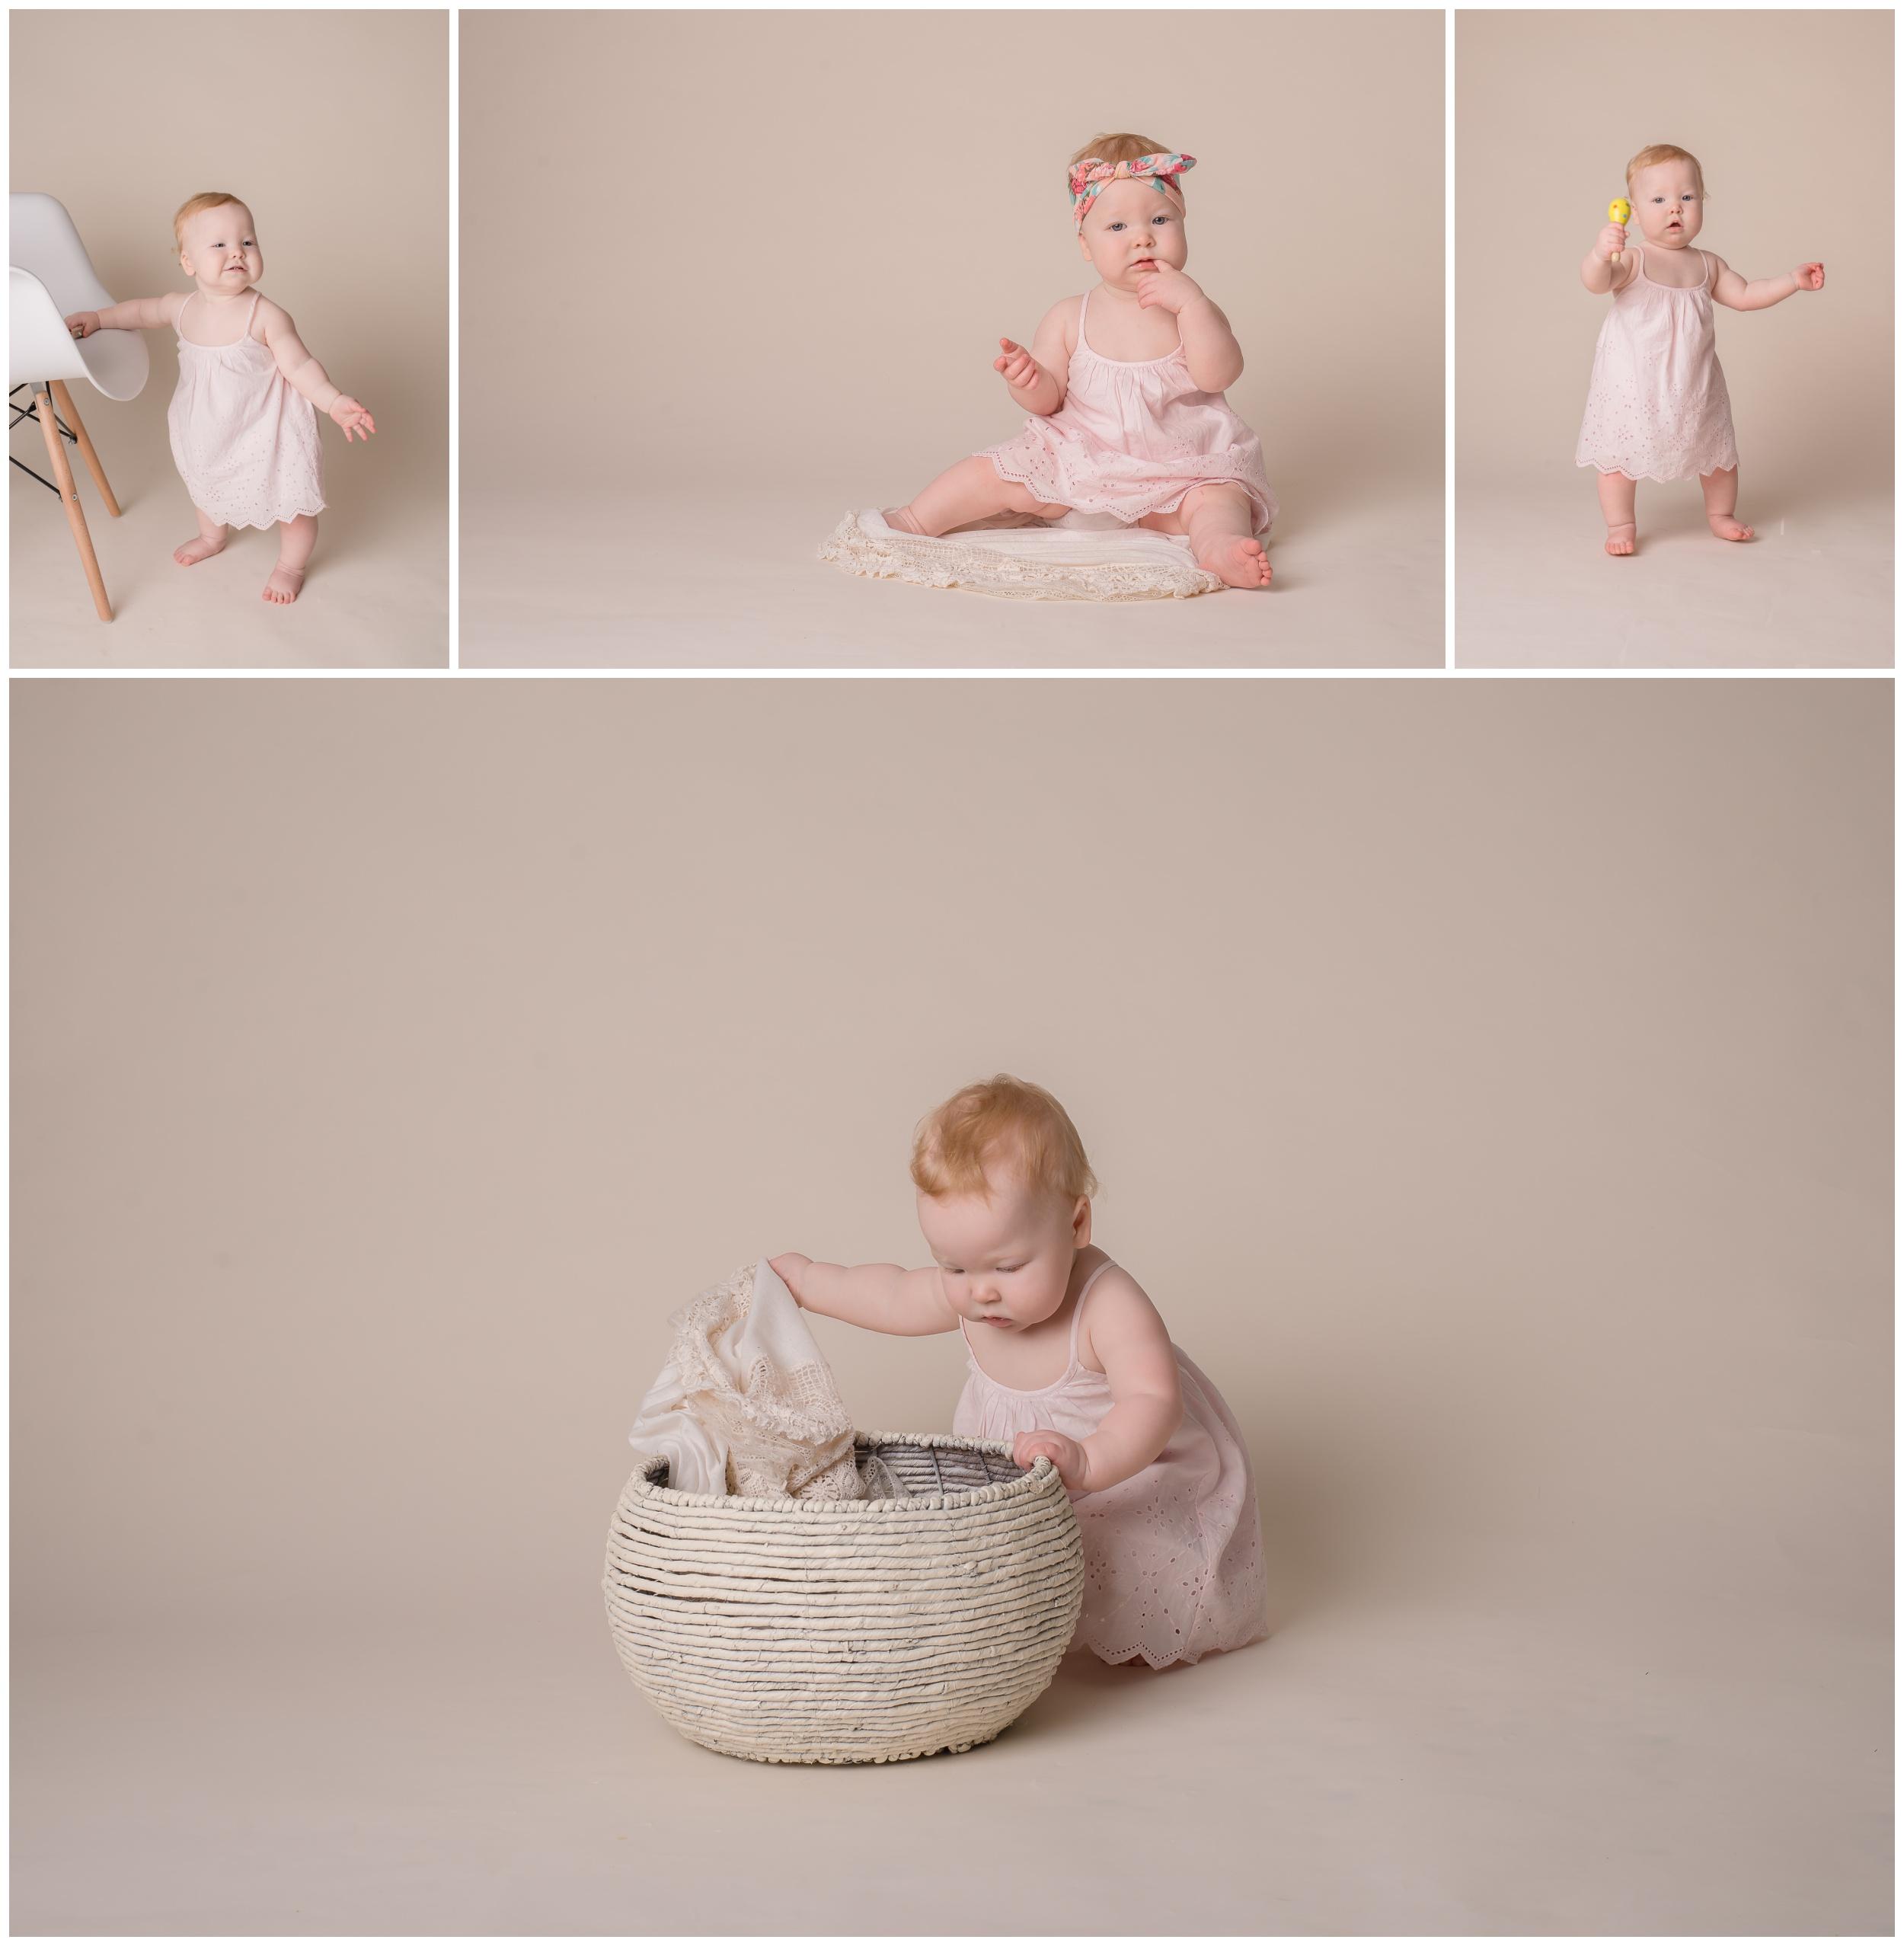 south_bend_Granger_Niles_Newborn_photographer_ashleywentzphotography_0271.jpg